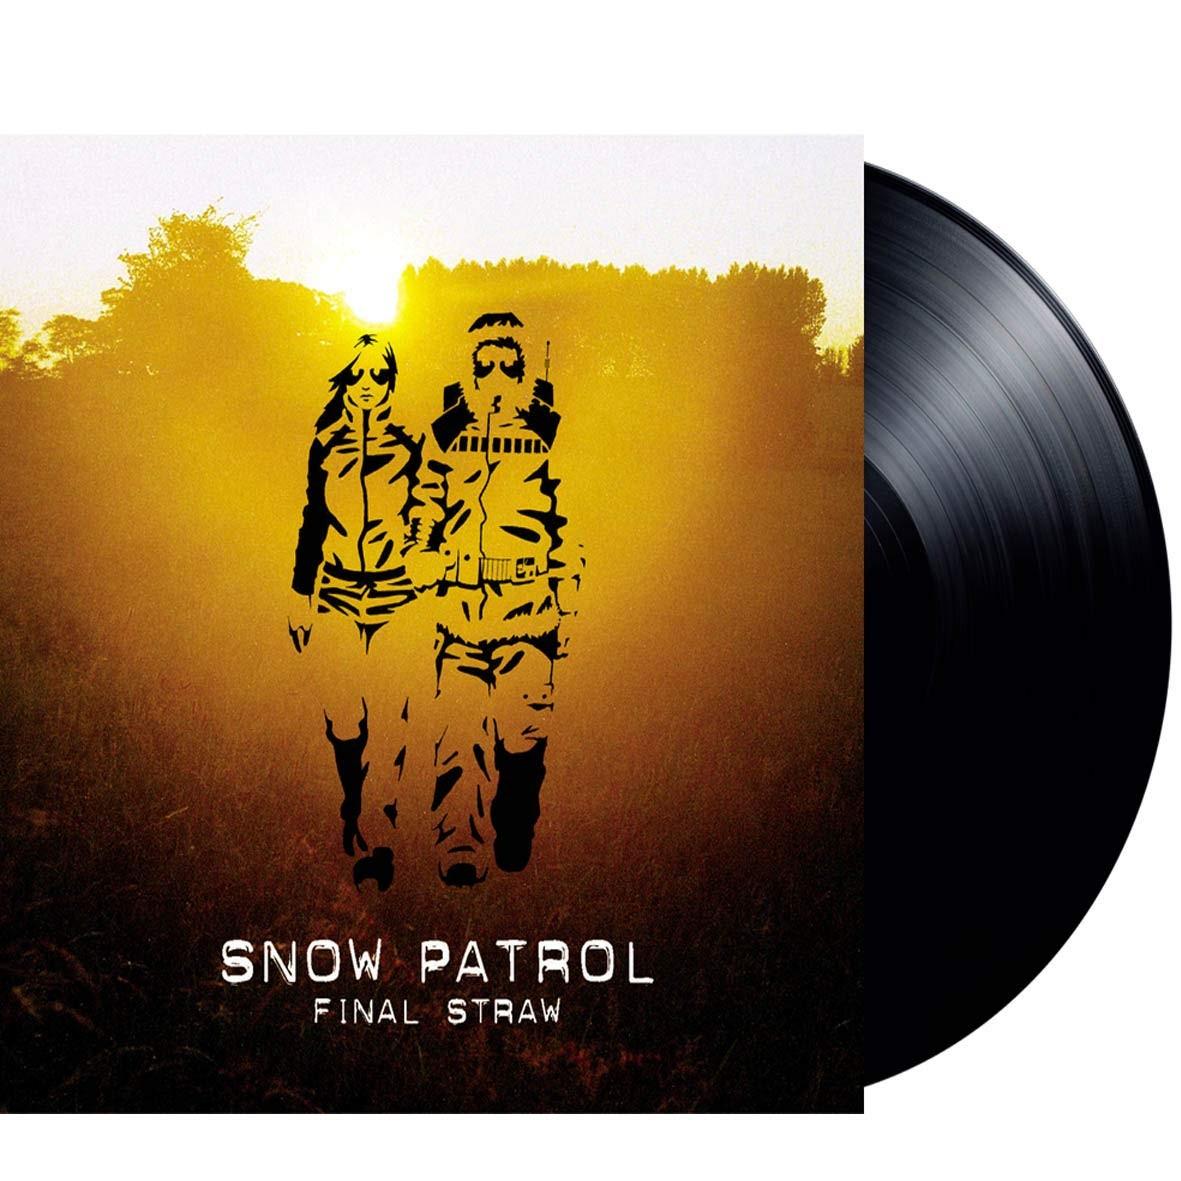 Snow Patrol - Final Straw 2XLP vinyl